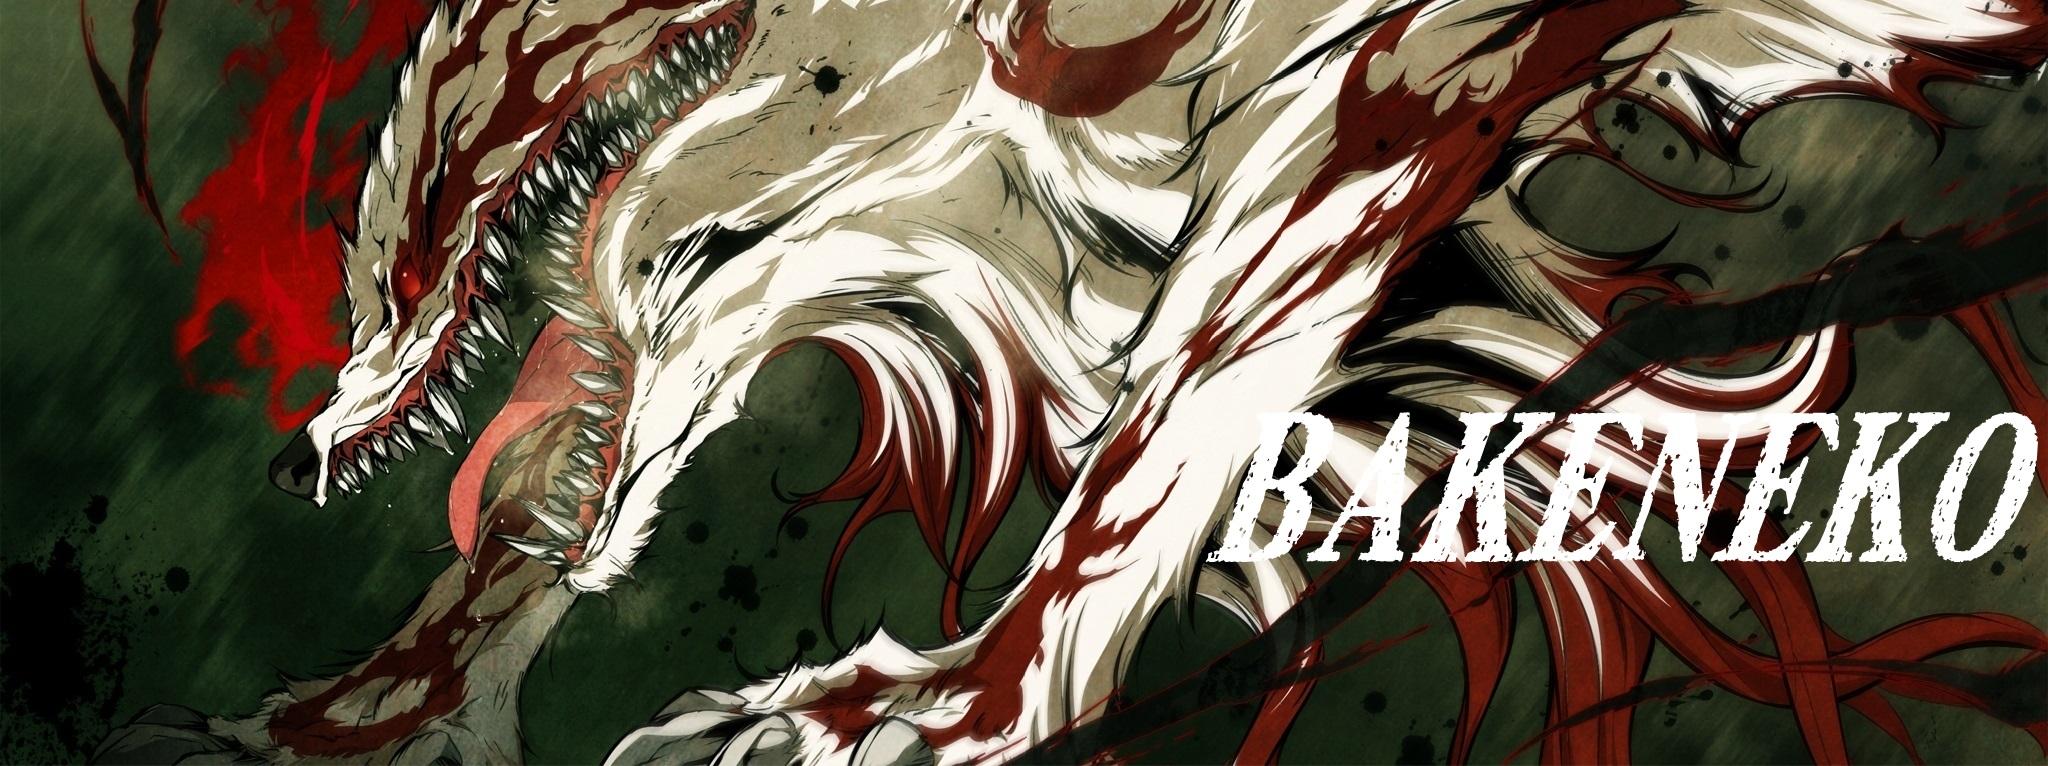 Pedidos de Testes - Página 3 338882_anime_monstr_past_klyki_krov_2048x1200_www-gdefon-ru